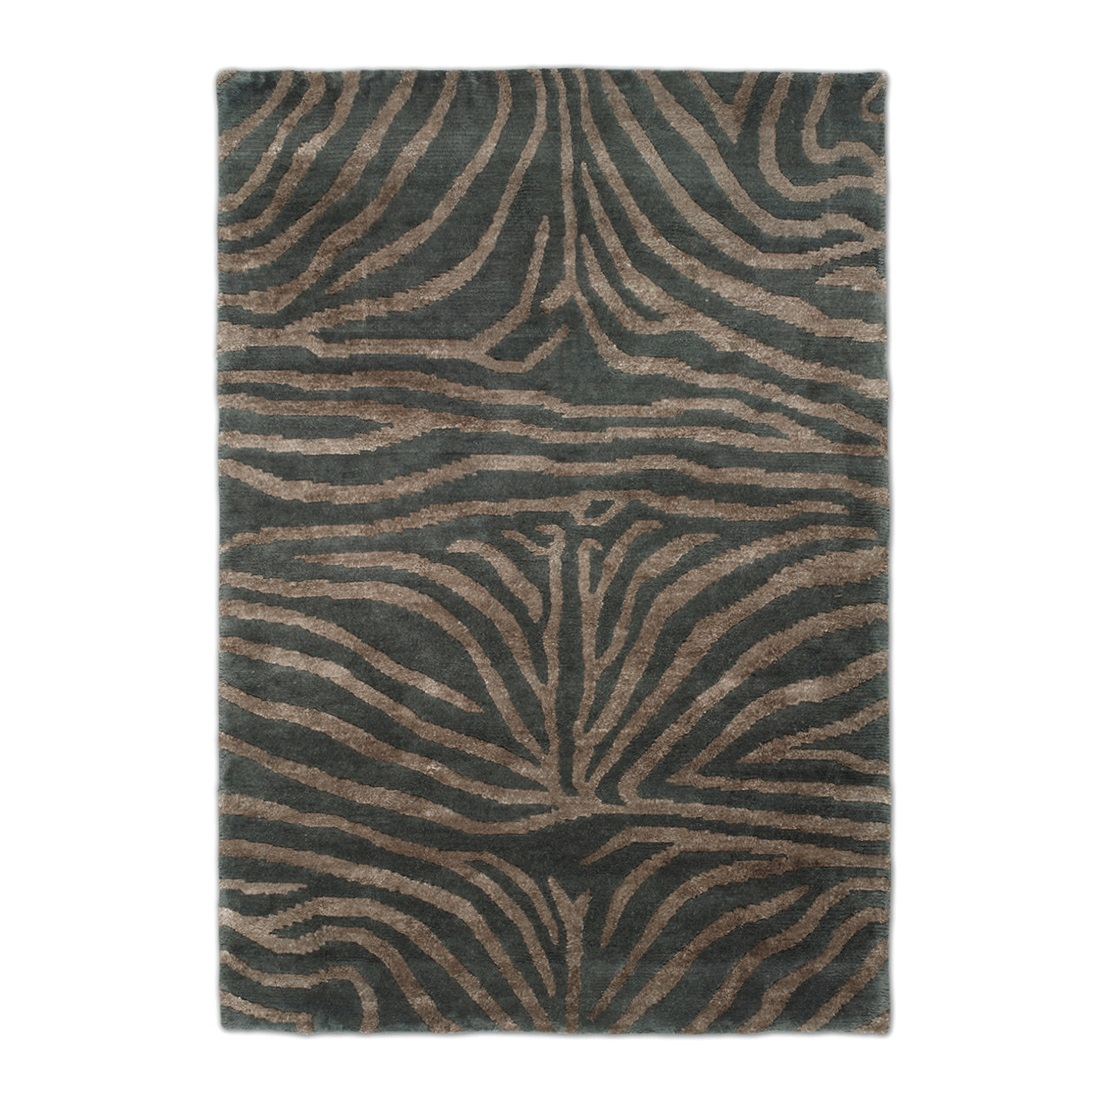 Zebramatta taupe 200 x 300 cm, Classic Collection